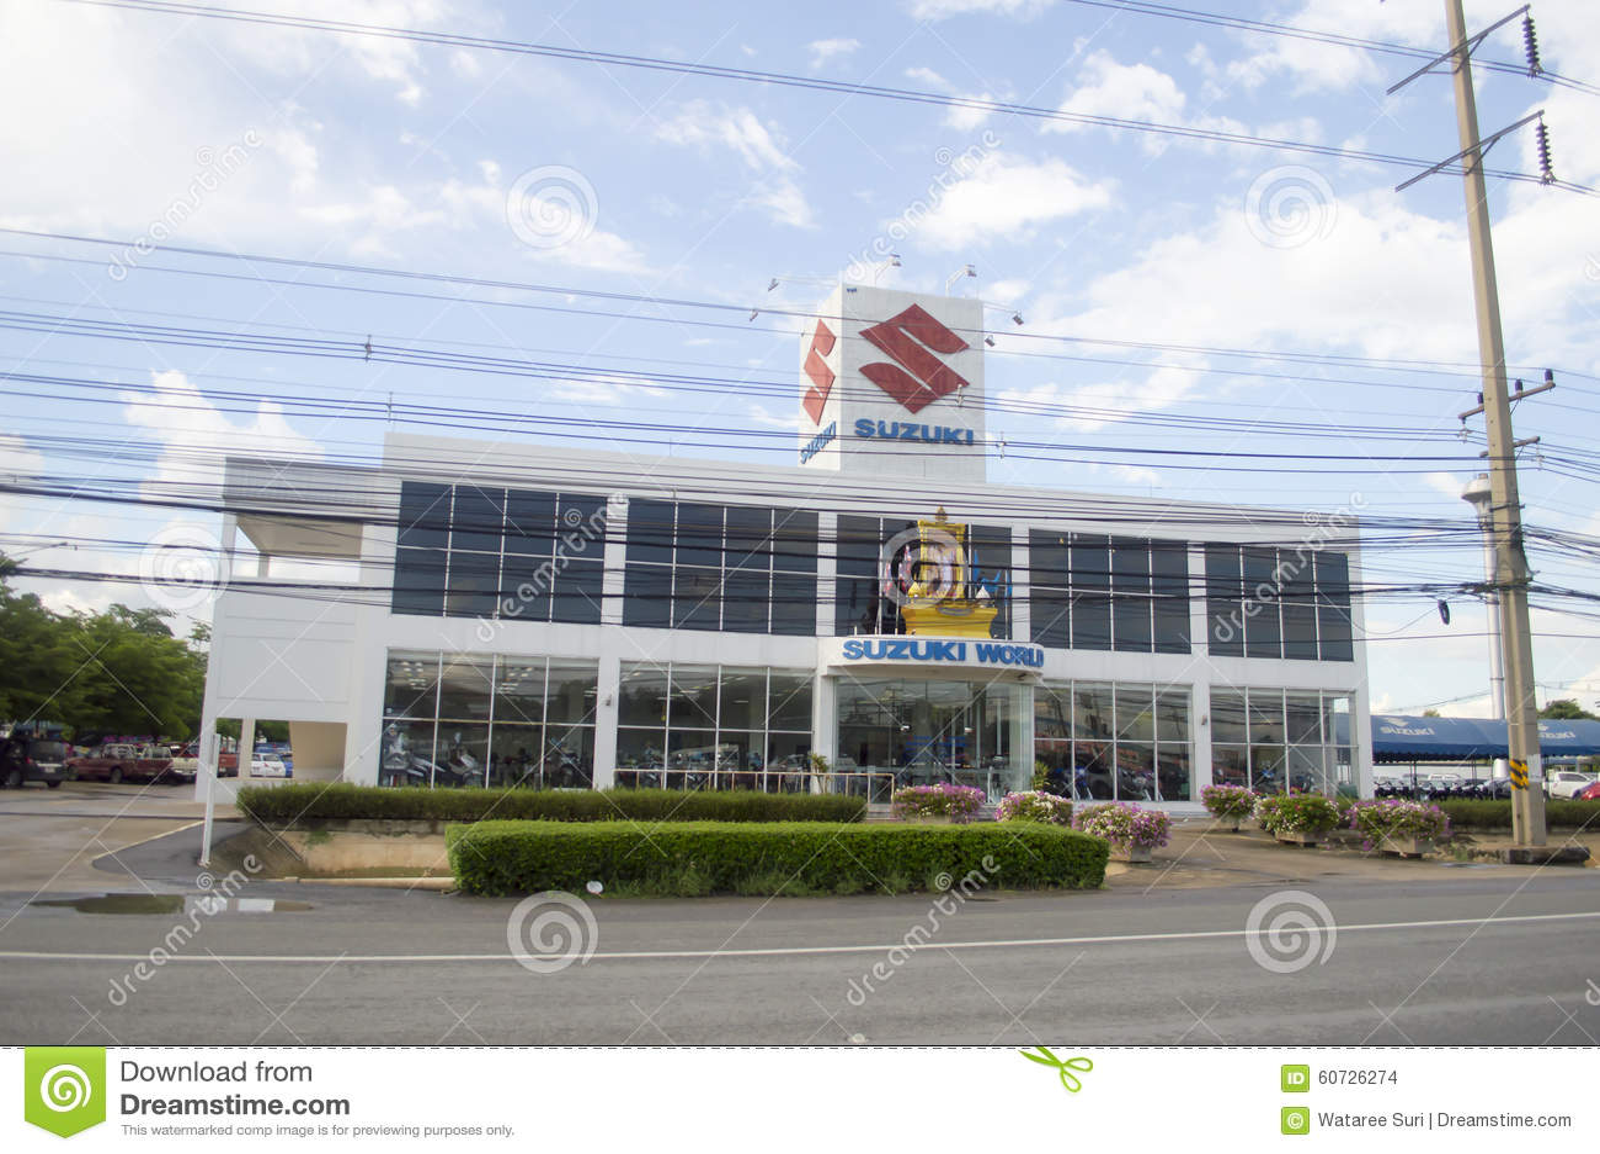 Suzuki Car Showroom And Service Center Editorial Stock Image Image